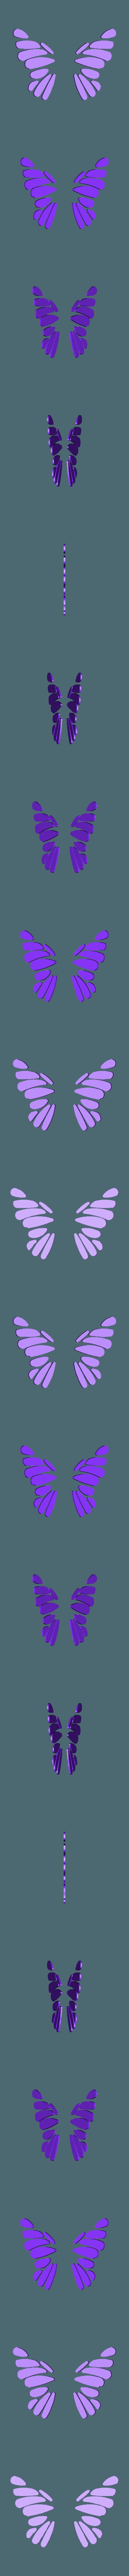 Wings_Infill.stl Download free STL file Butterfly • 3D printer model, gzumwalt